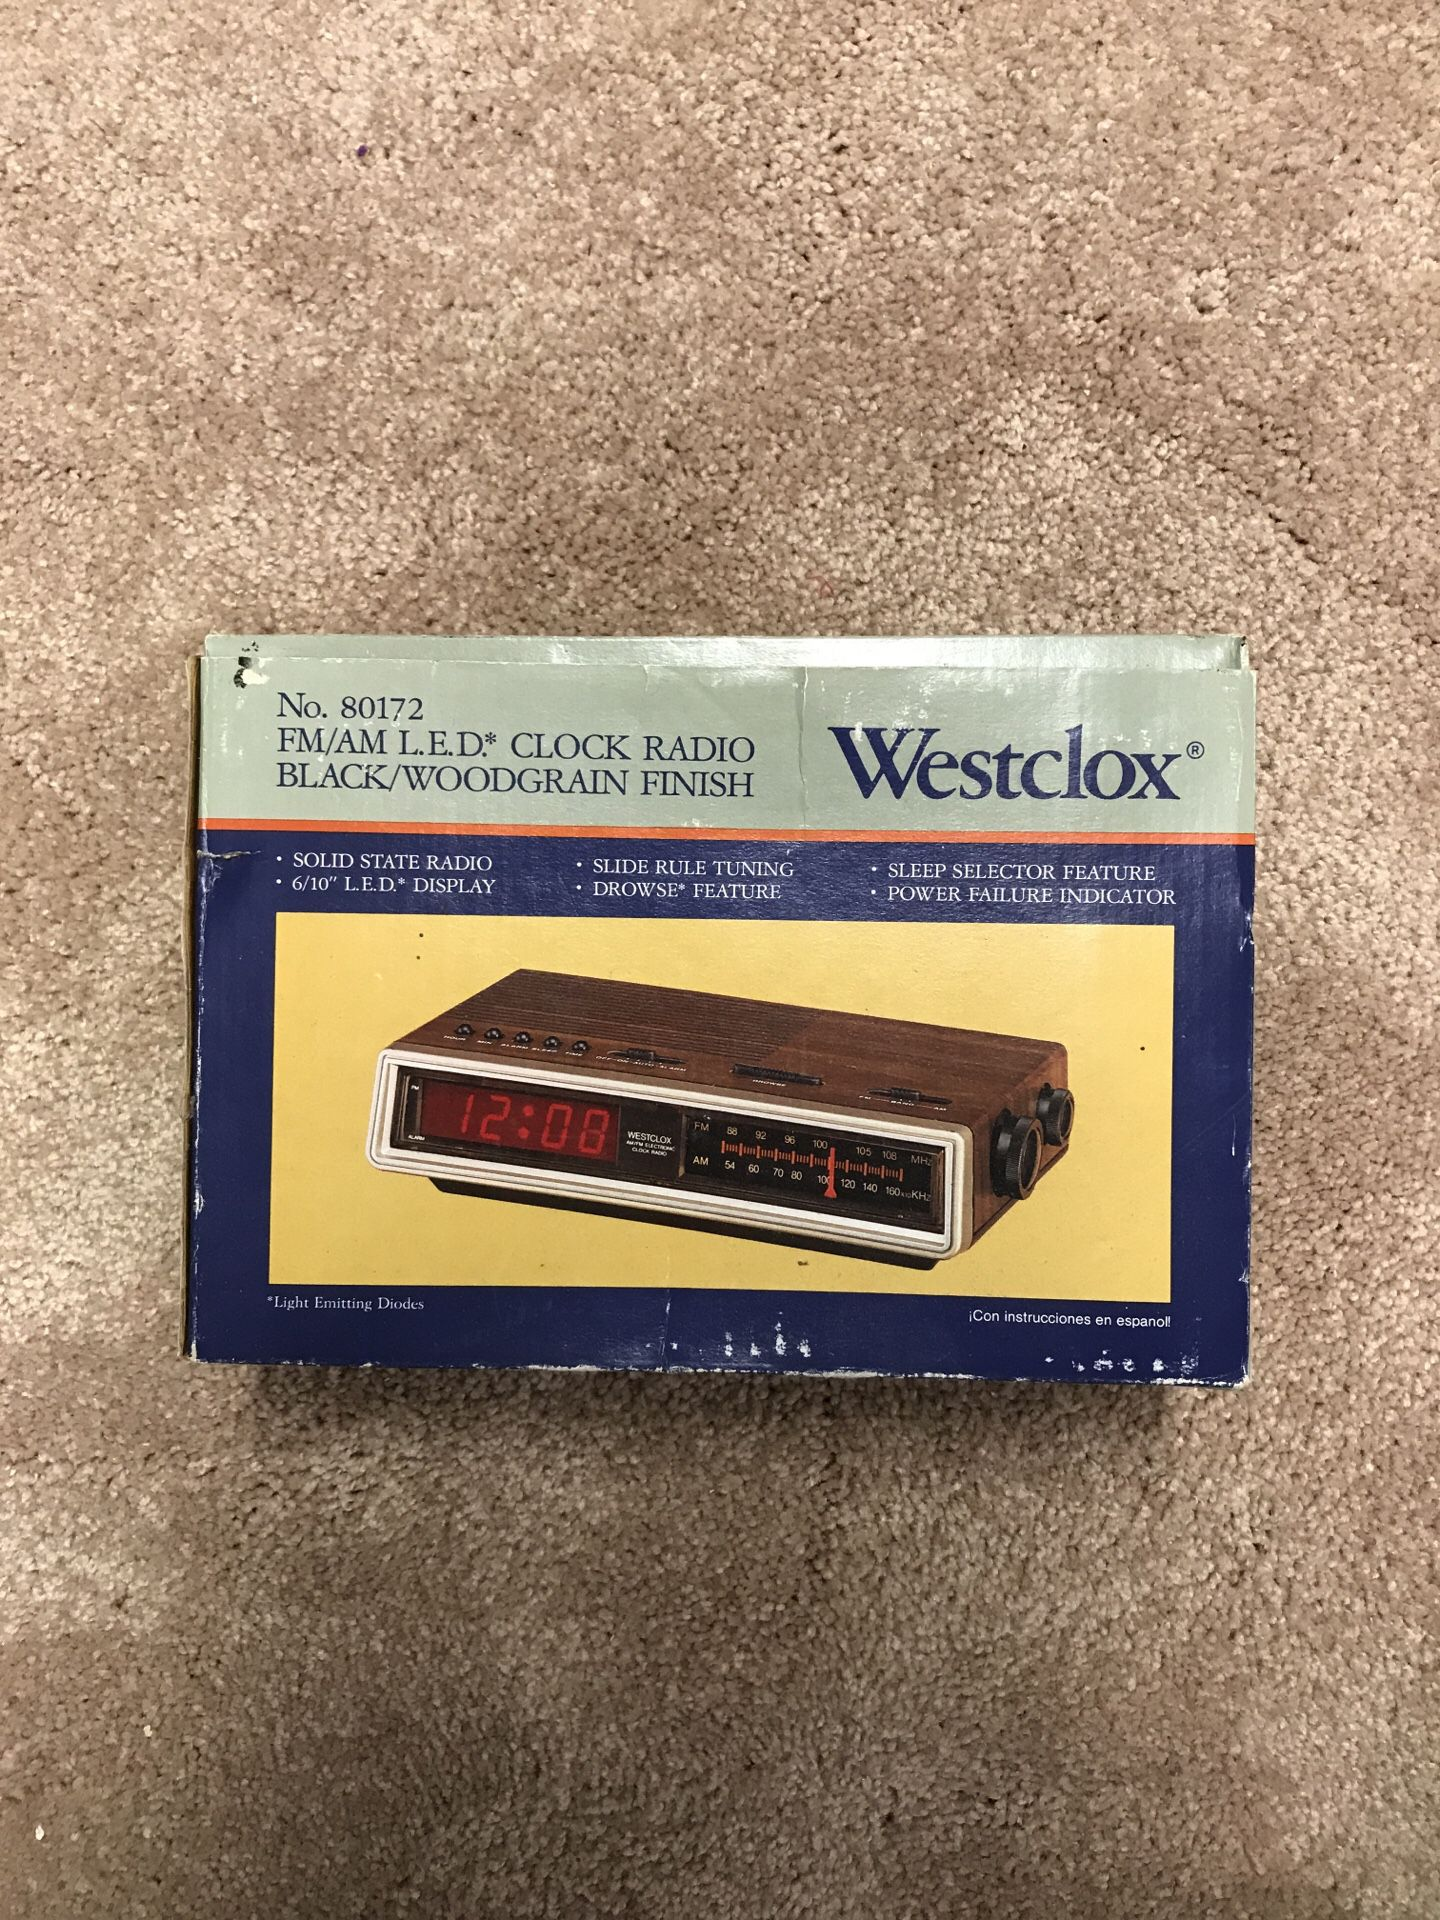 Vintage alarm clock with radio